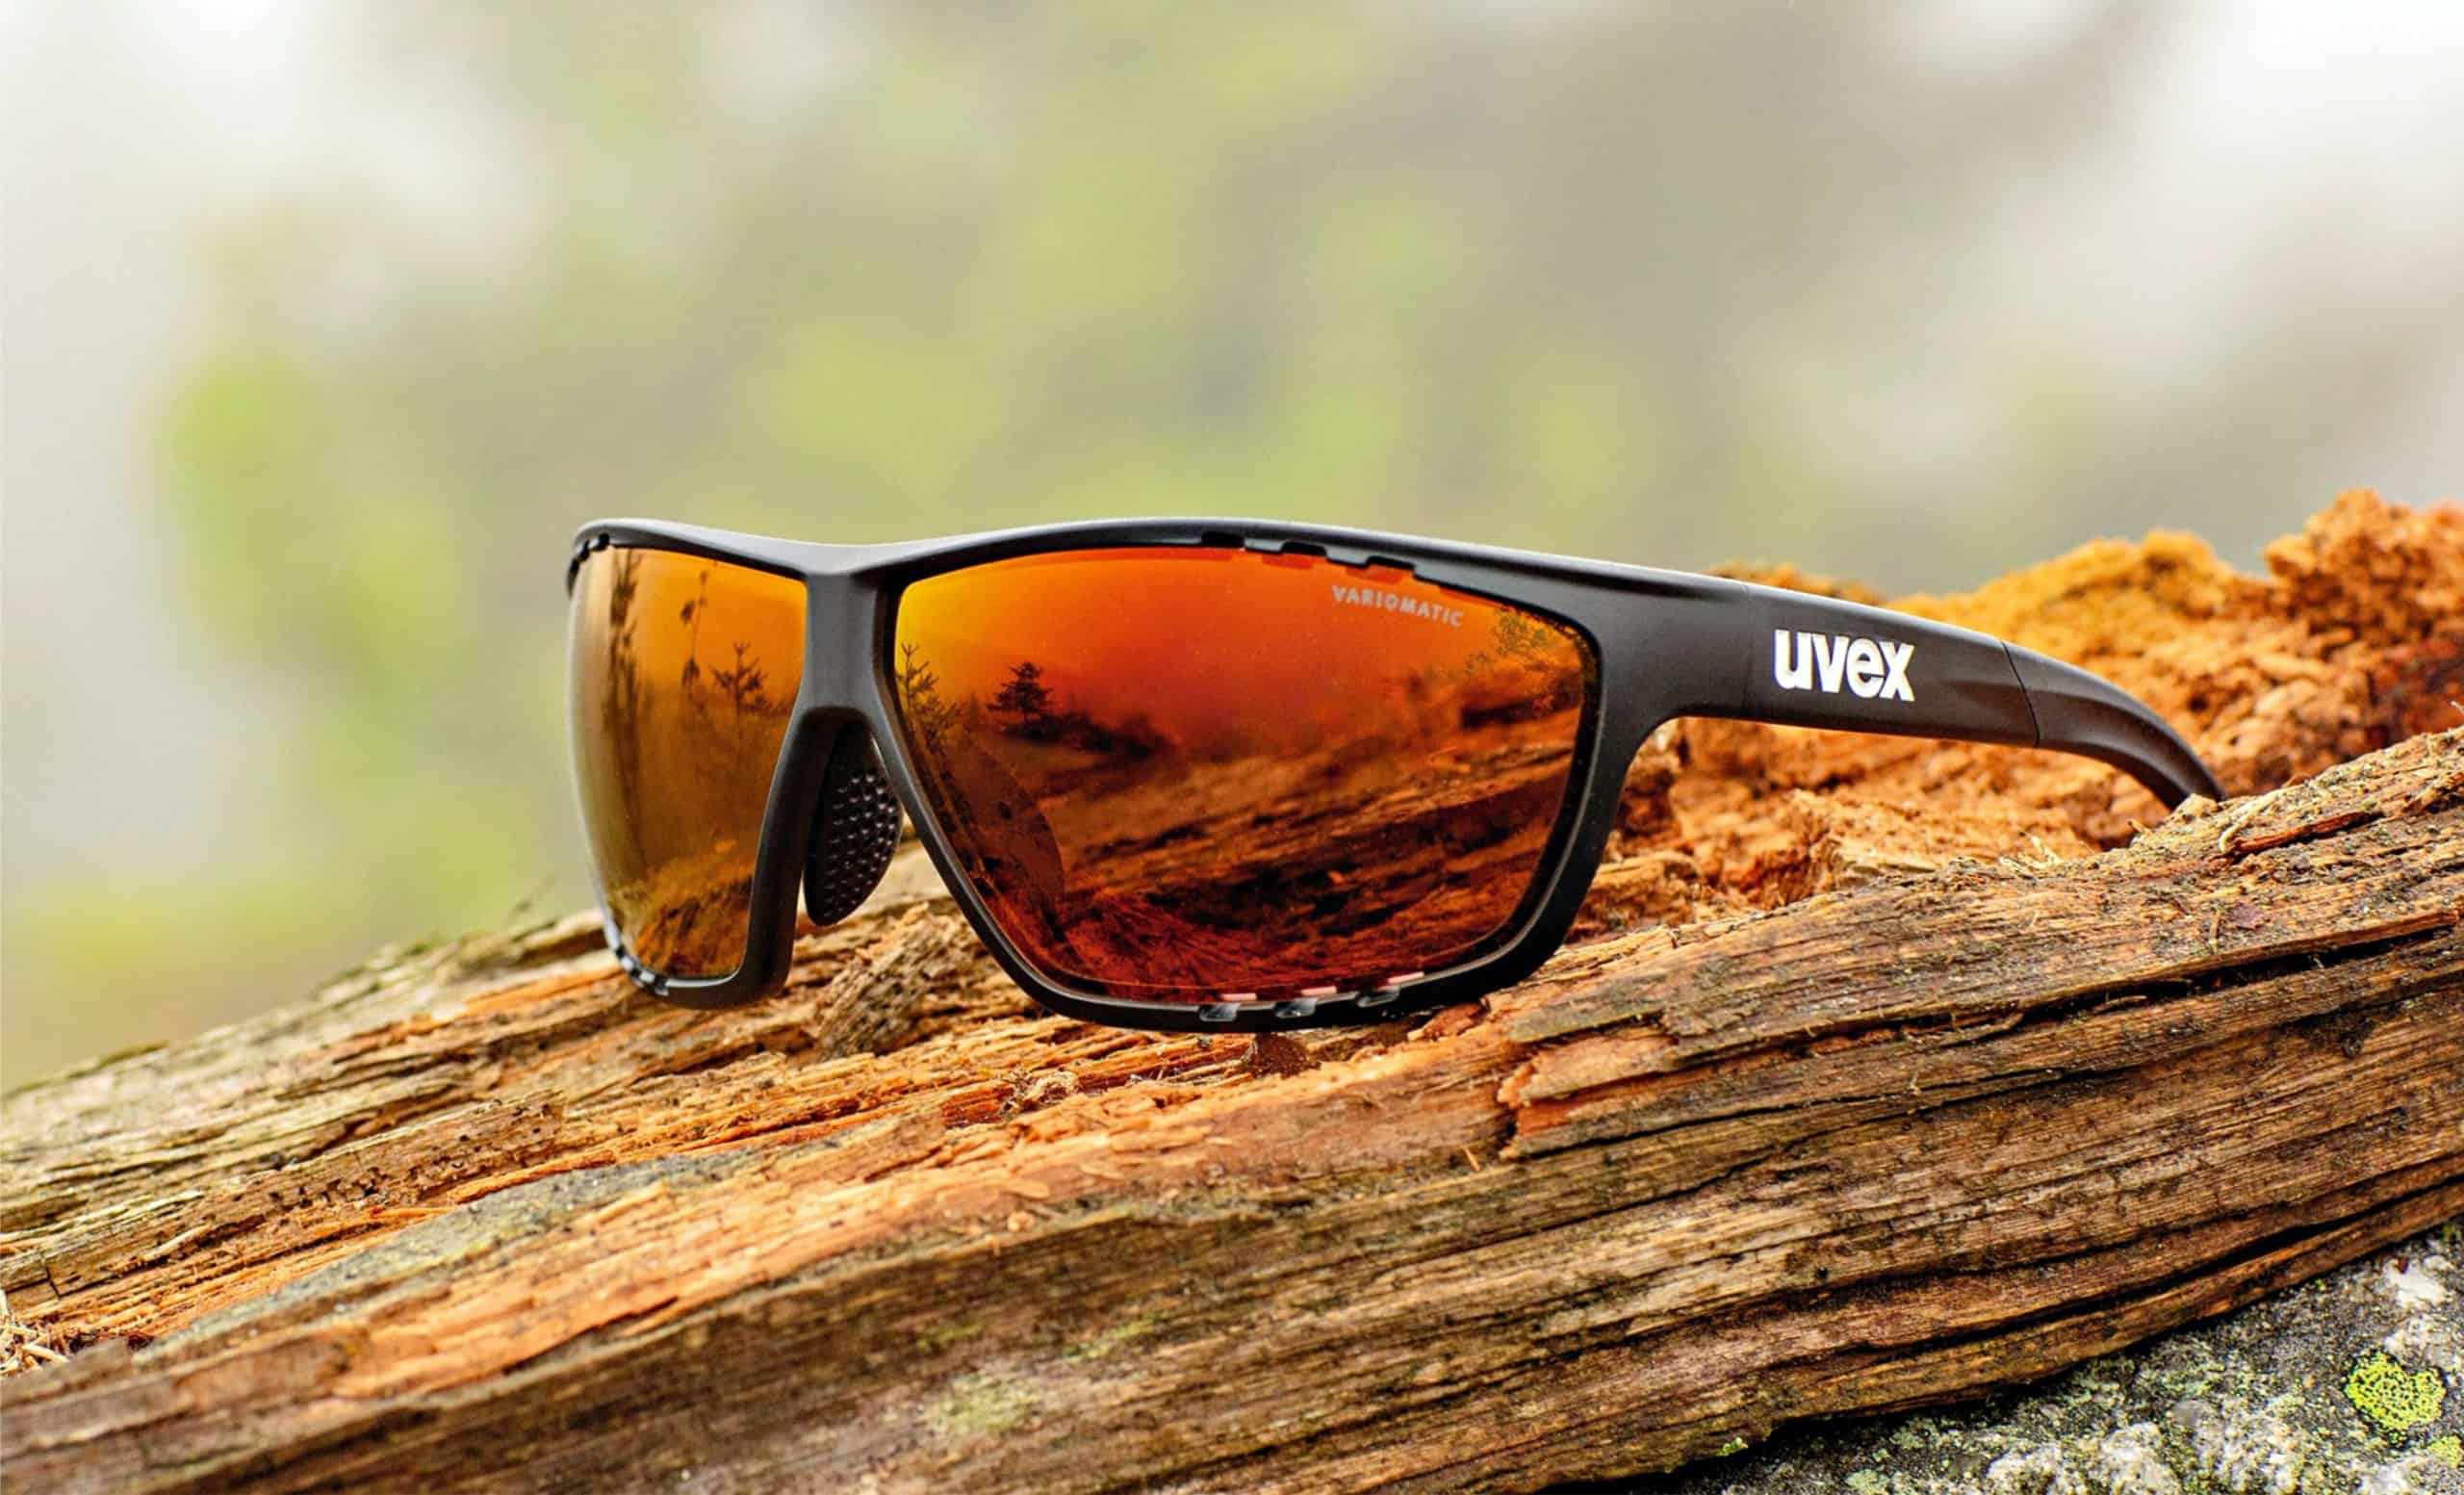 Okulary Uvex - BAS Kreacja